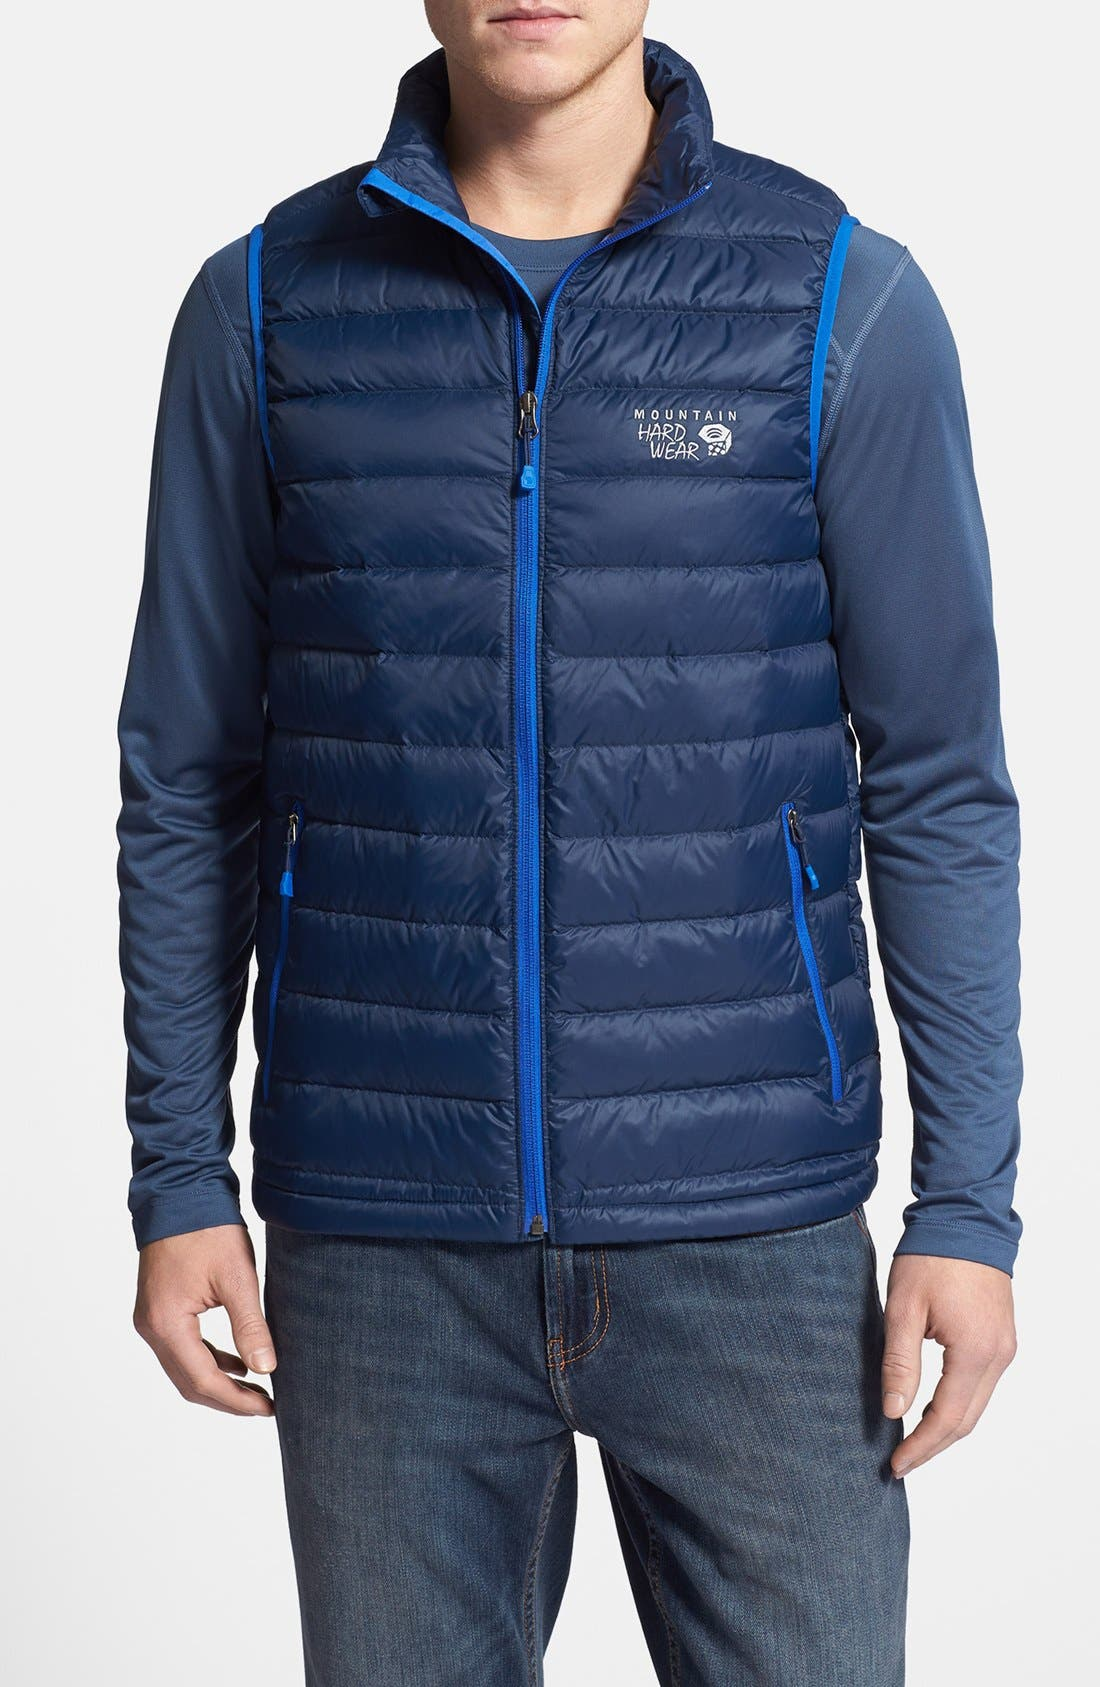 Alternate Image 1 Selected - Mountain Hardwear 'Nitrous' Down Vest